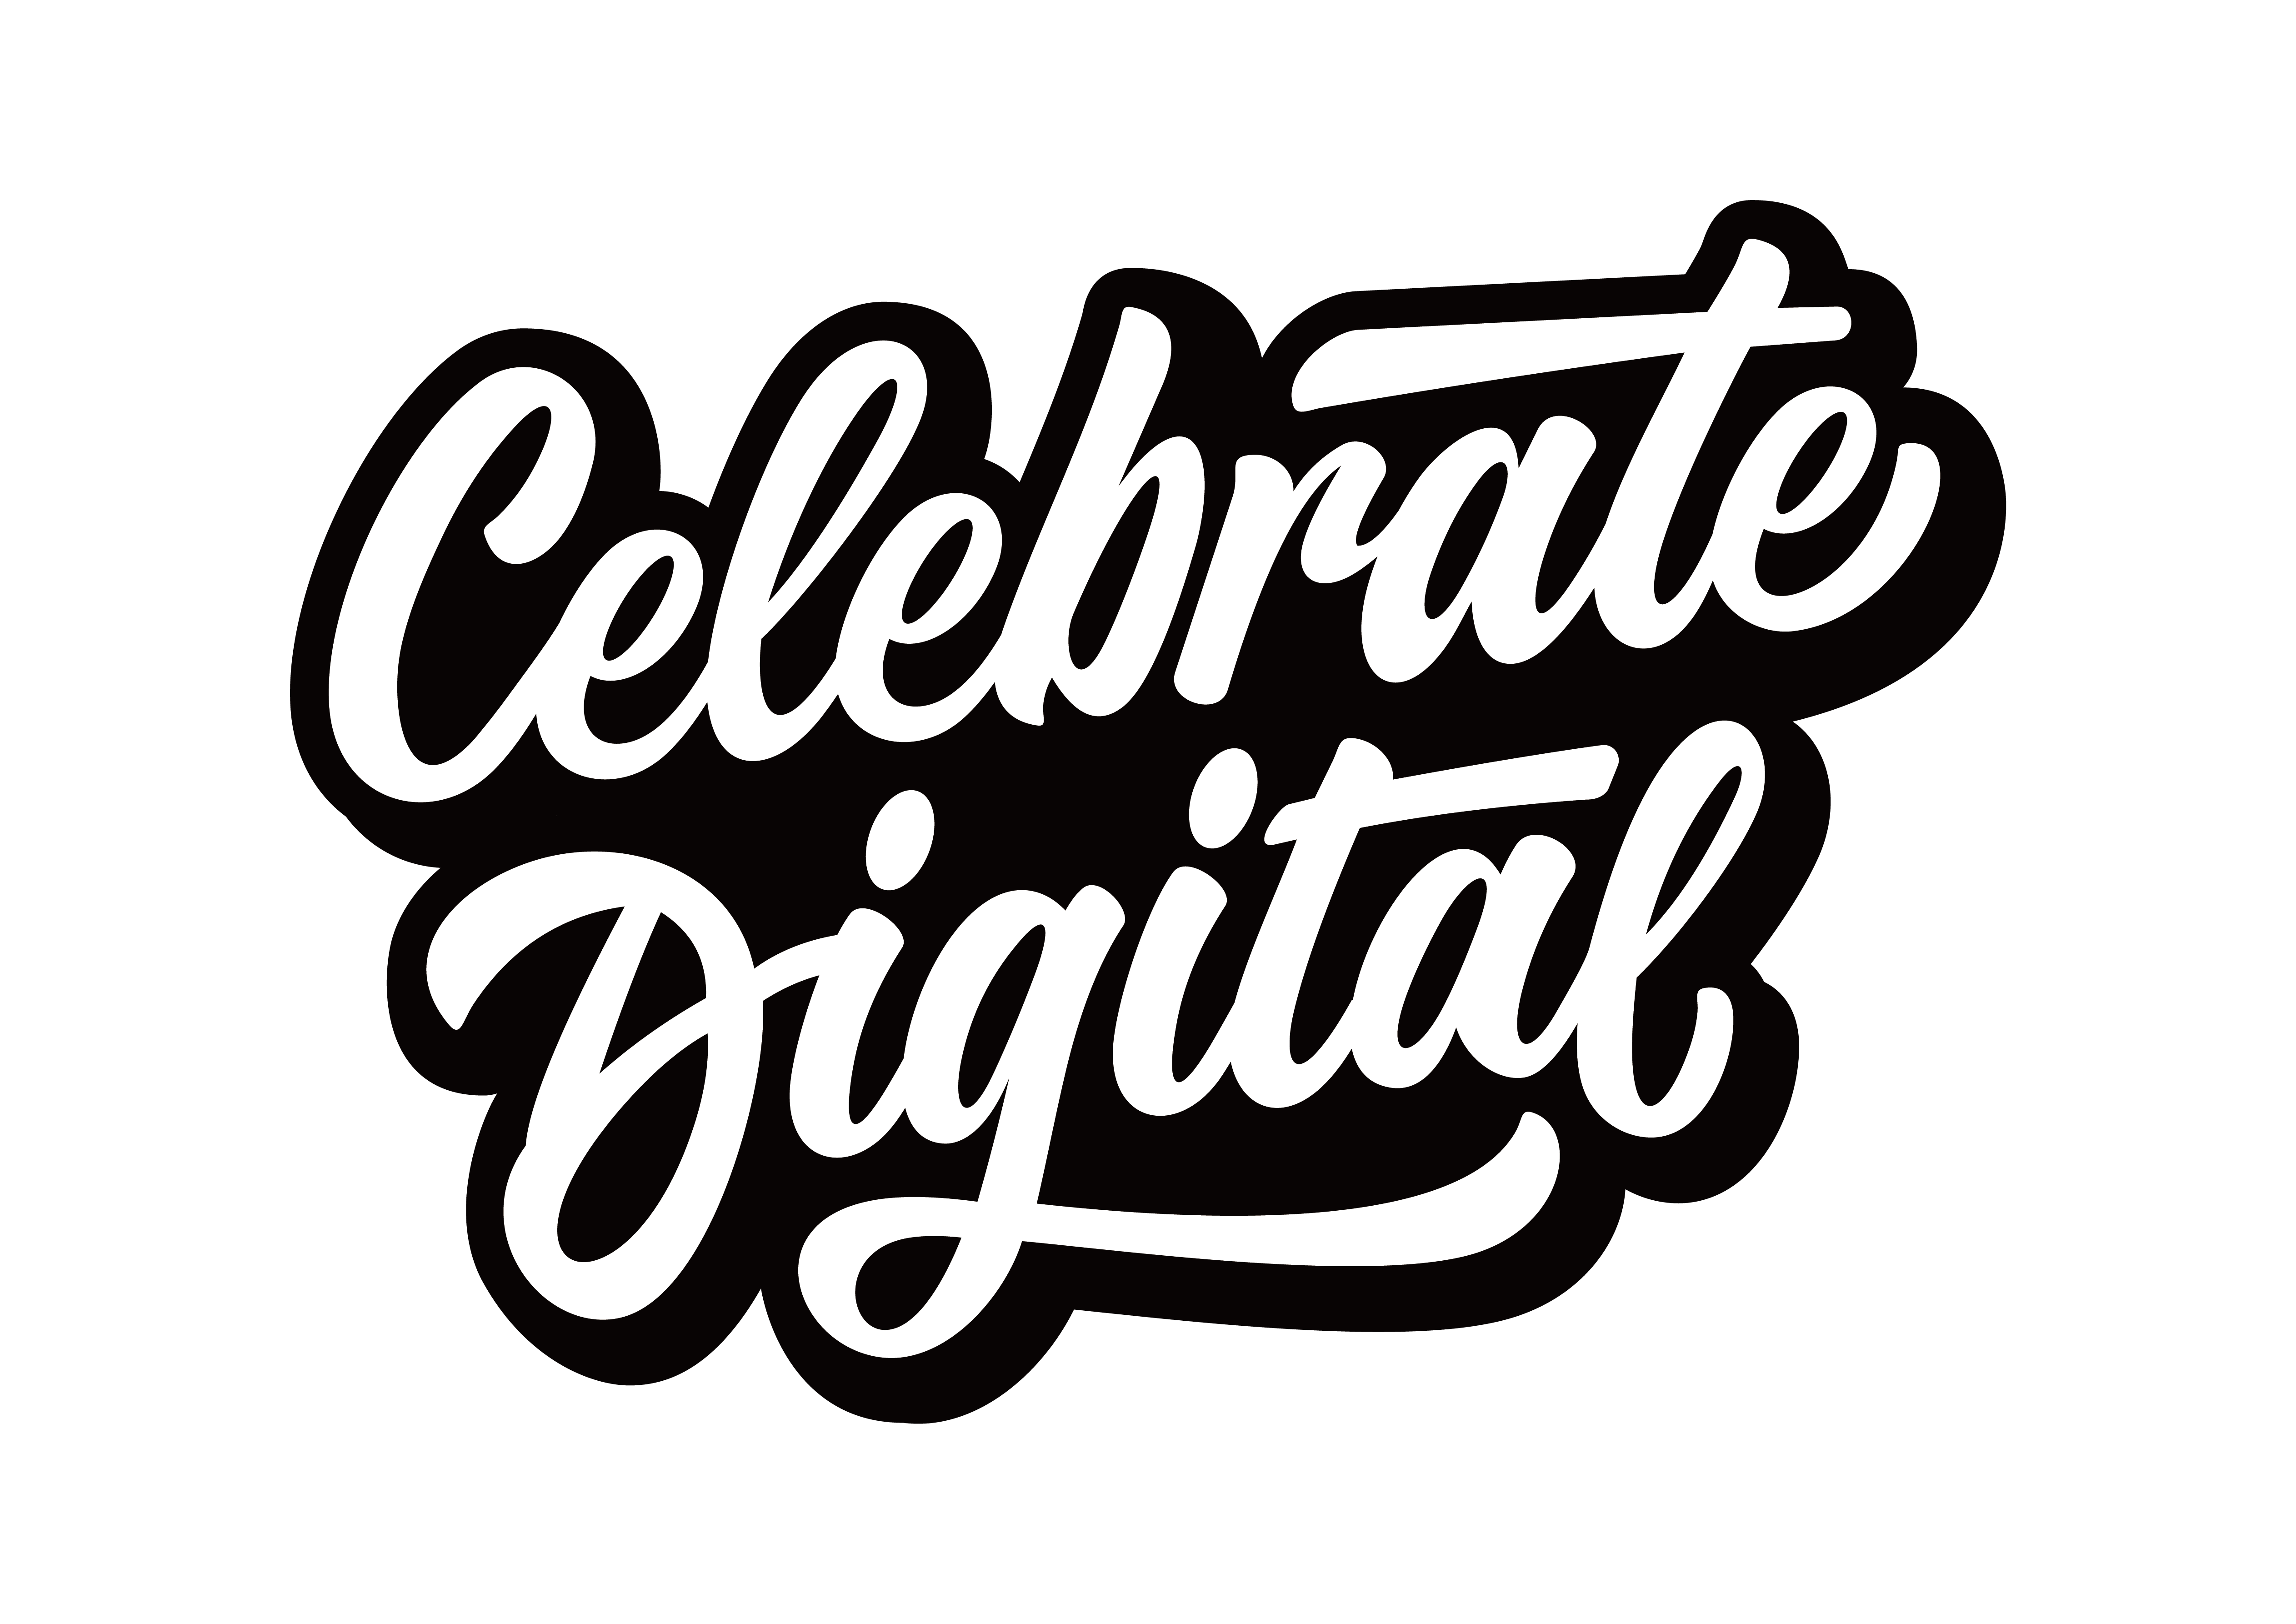 Celebrate Digital